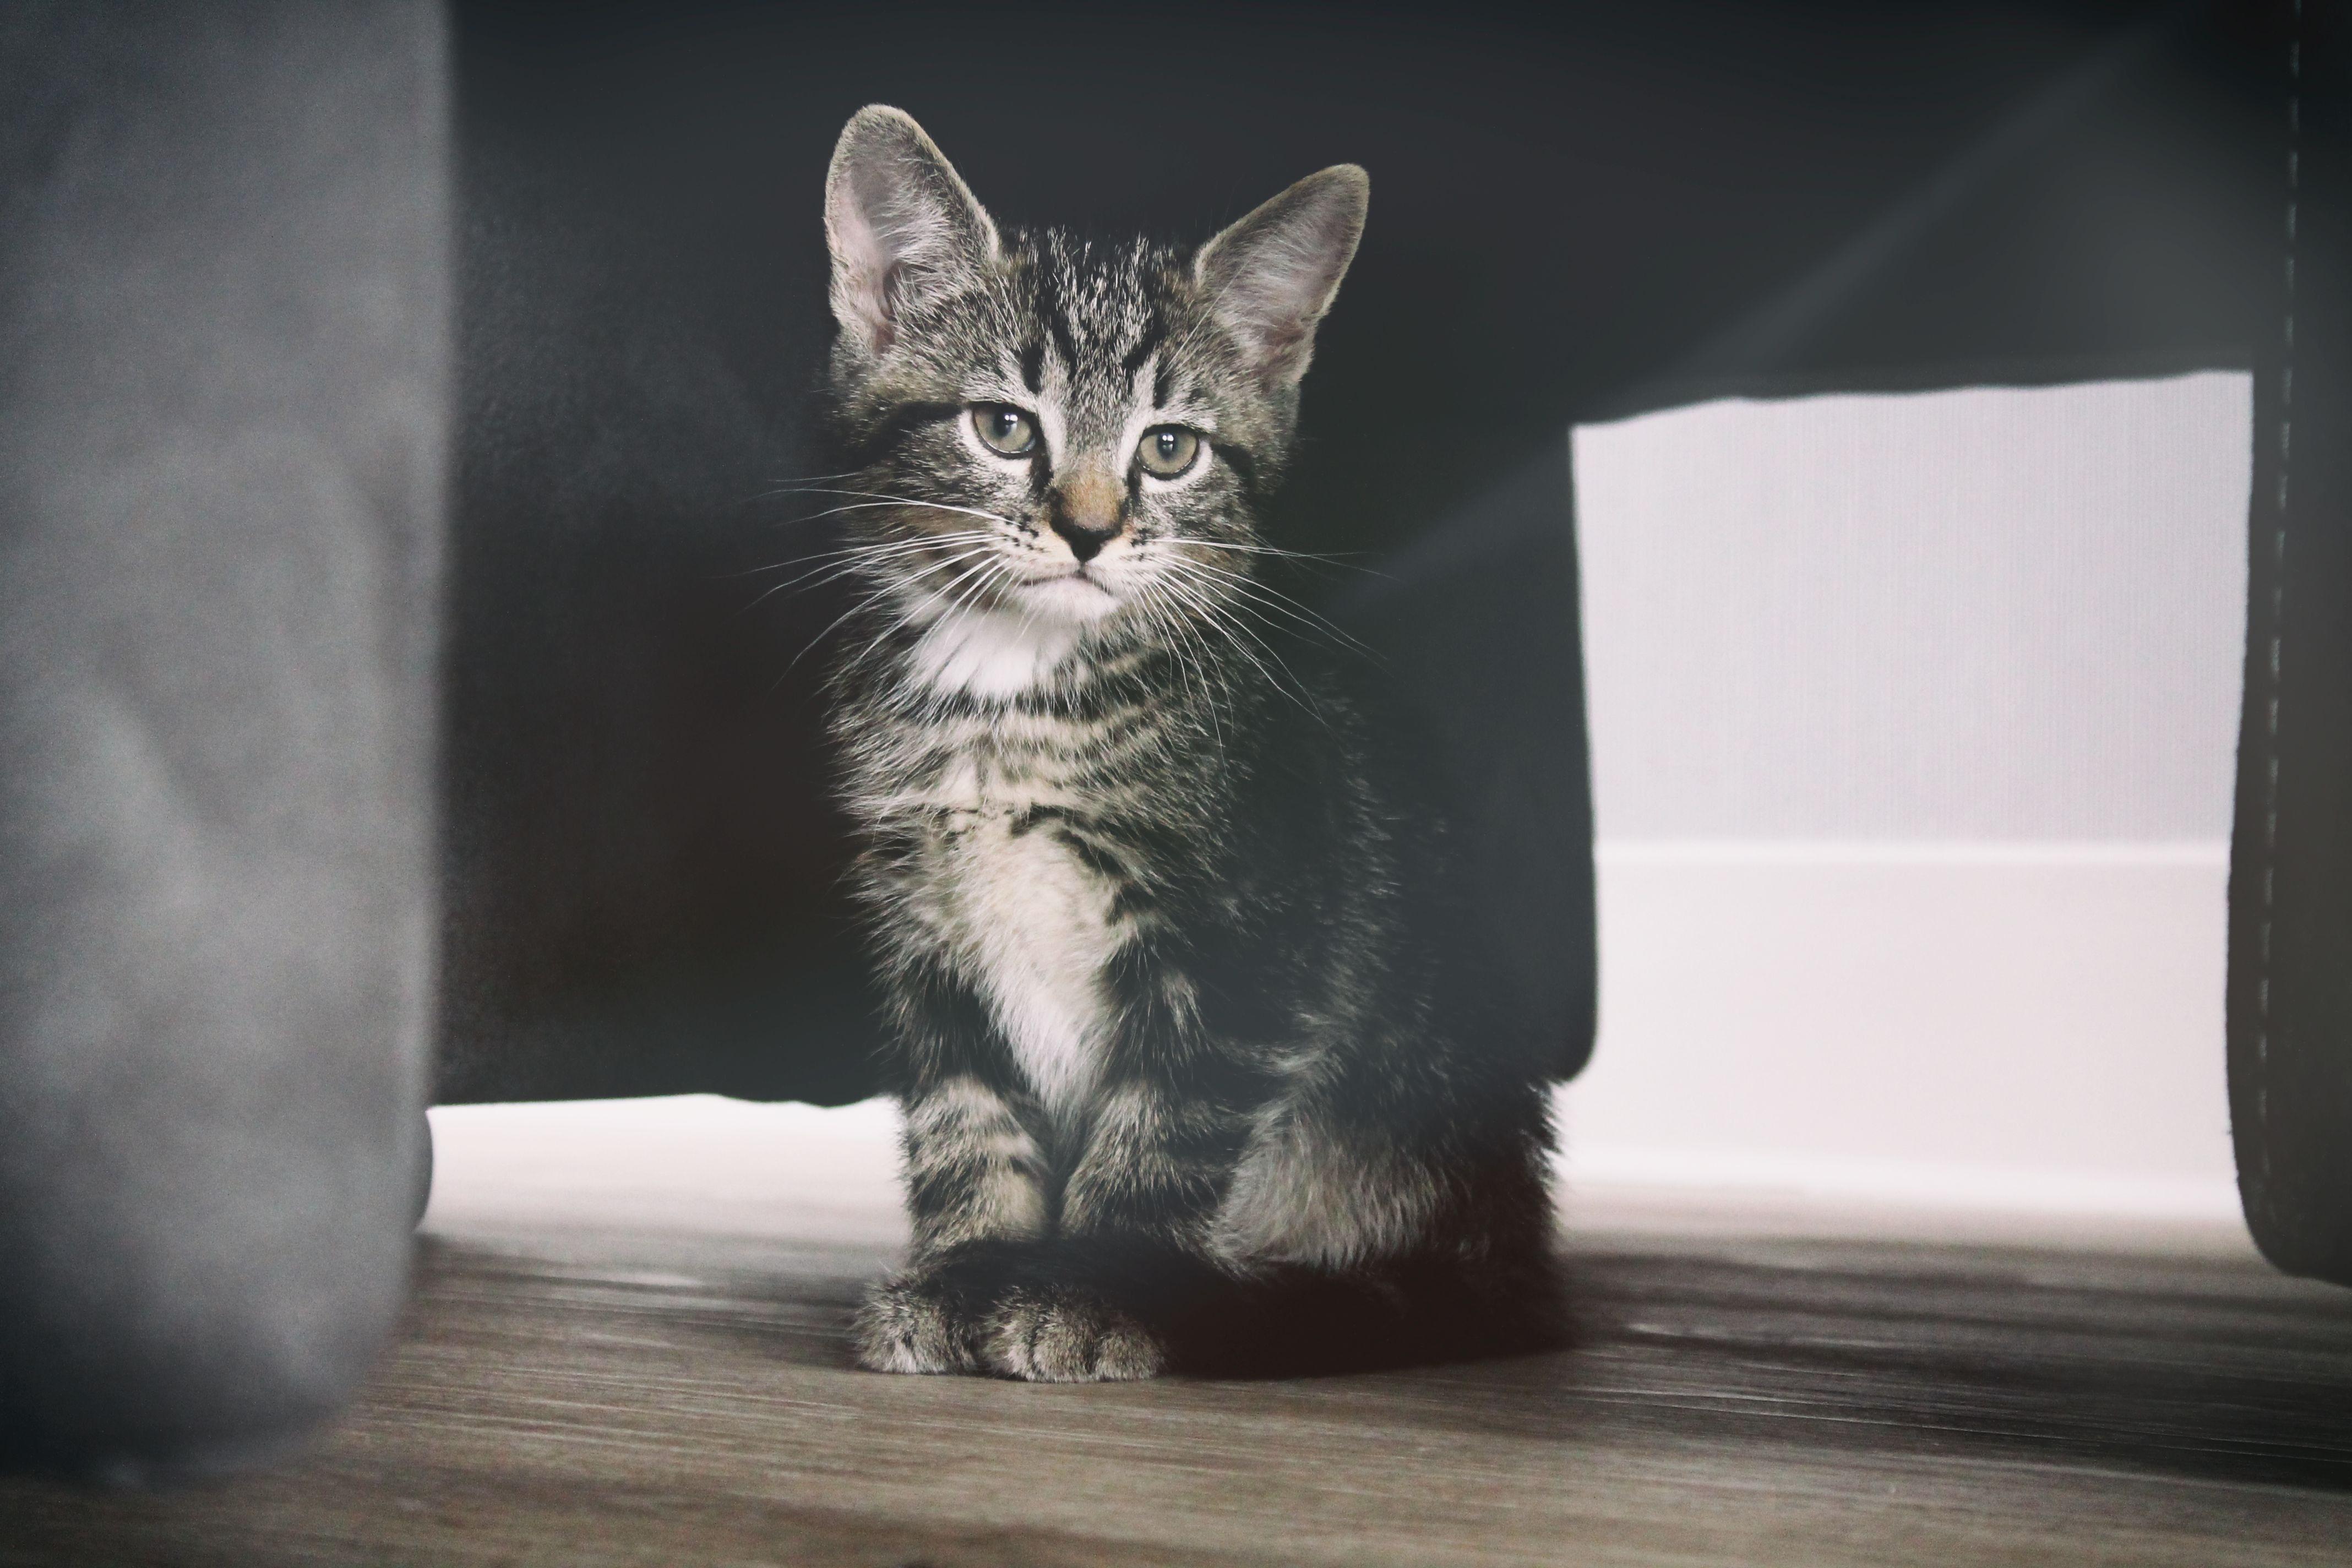 A tabby kitten sitting on a wooden floor